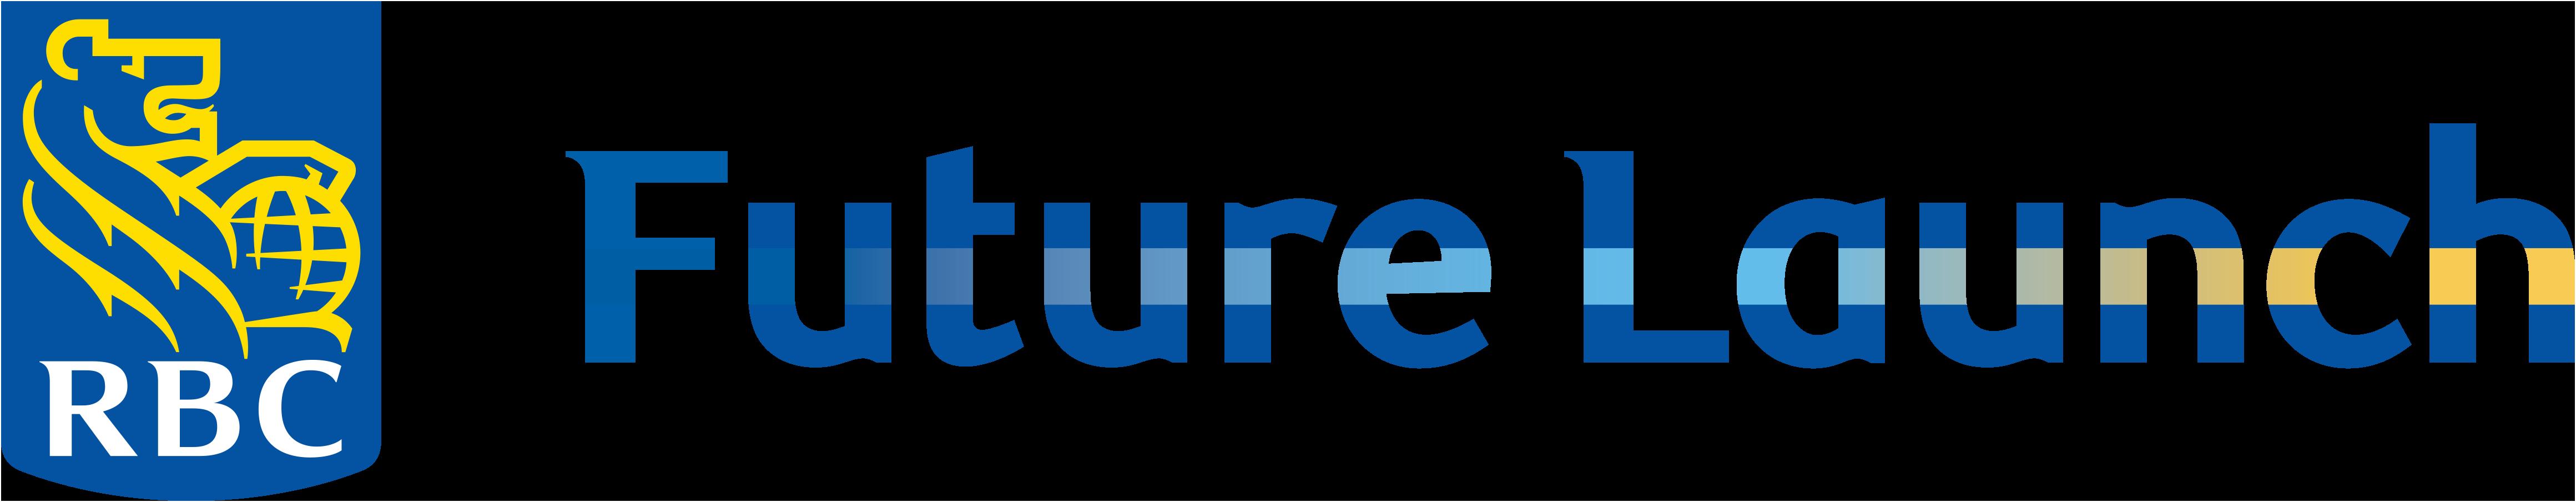 RBC_FutureLaunch_NoR_rgb_PE